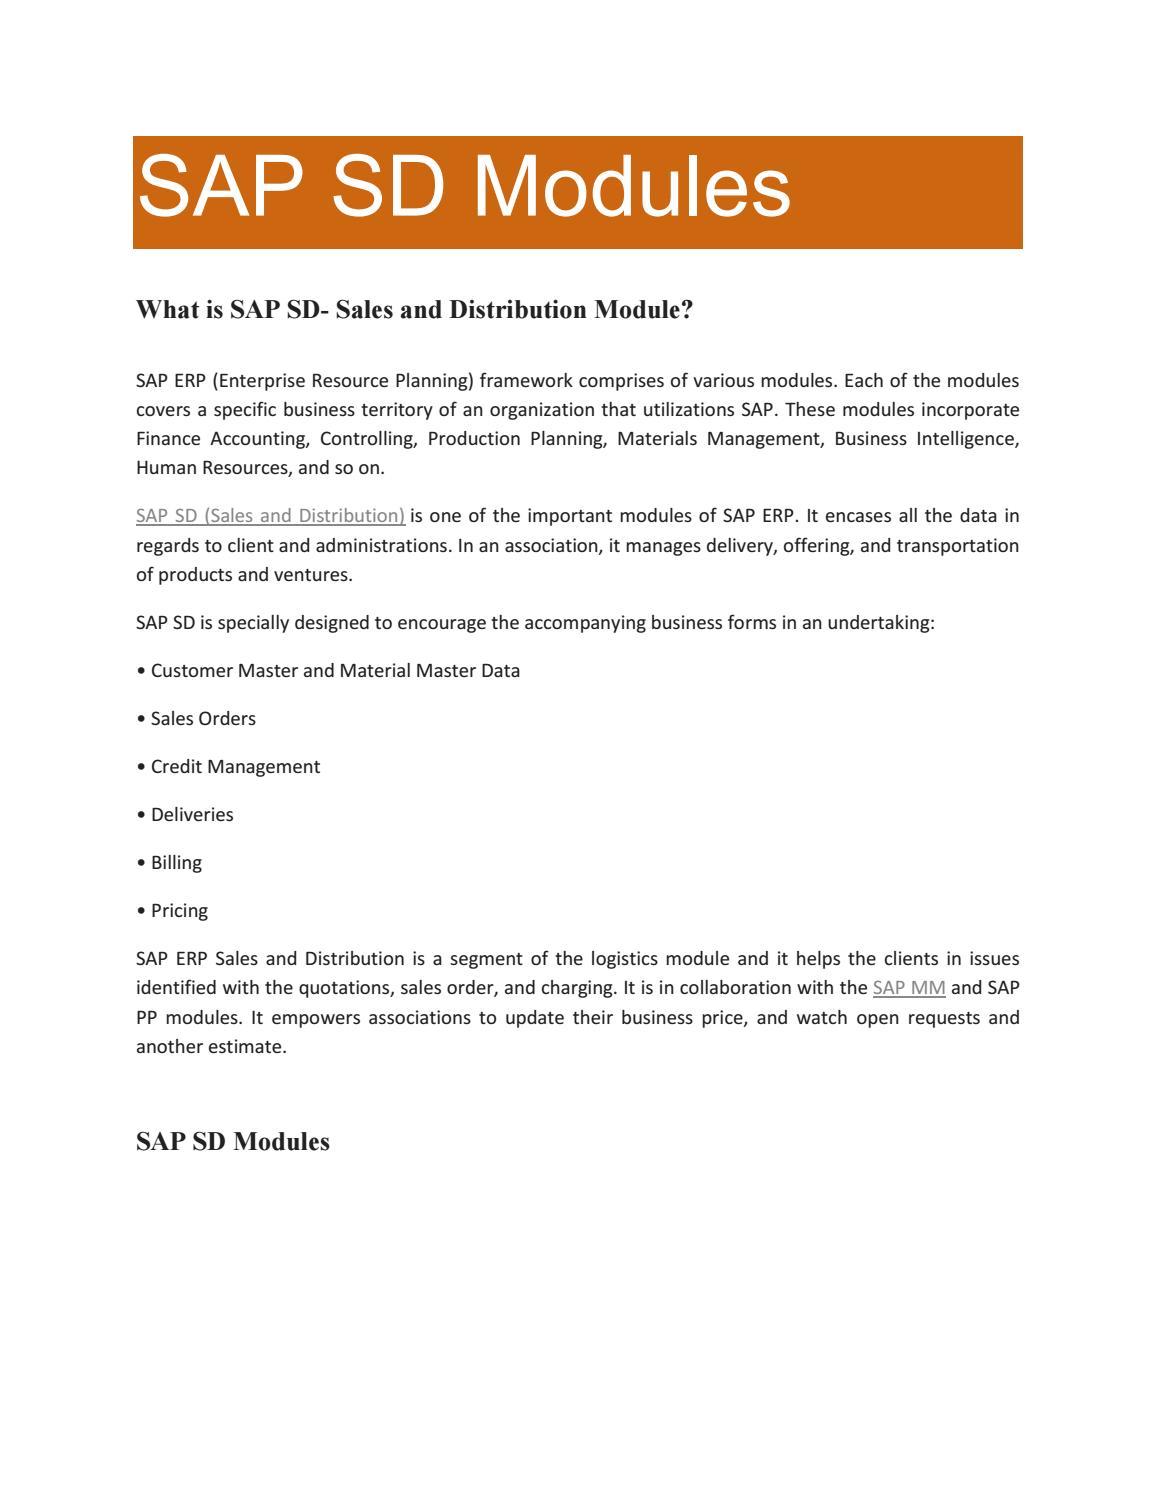 SAP SD Training PDF by shruti allentics - issuu